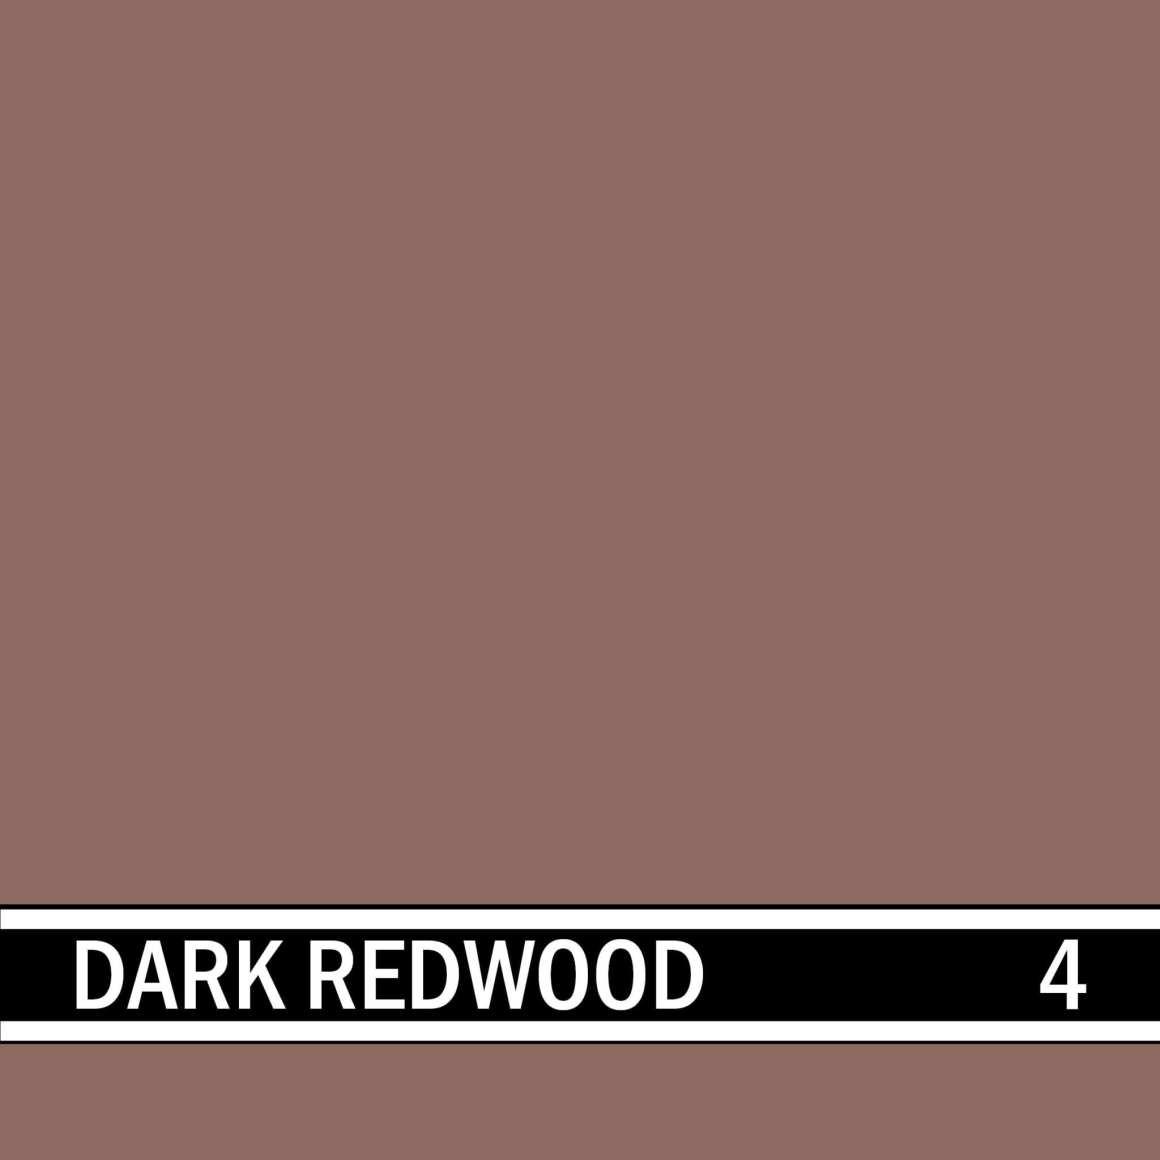 Dark Redwood integral concrete color for stamped concrete and decorative colored concrete